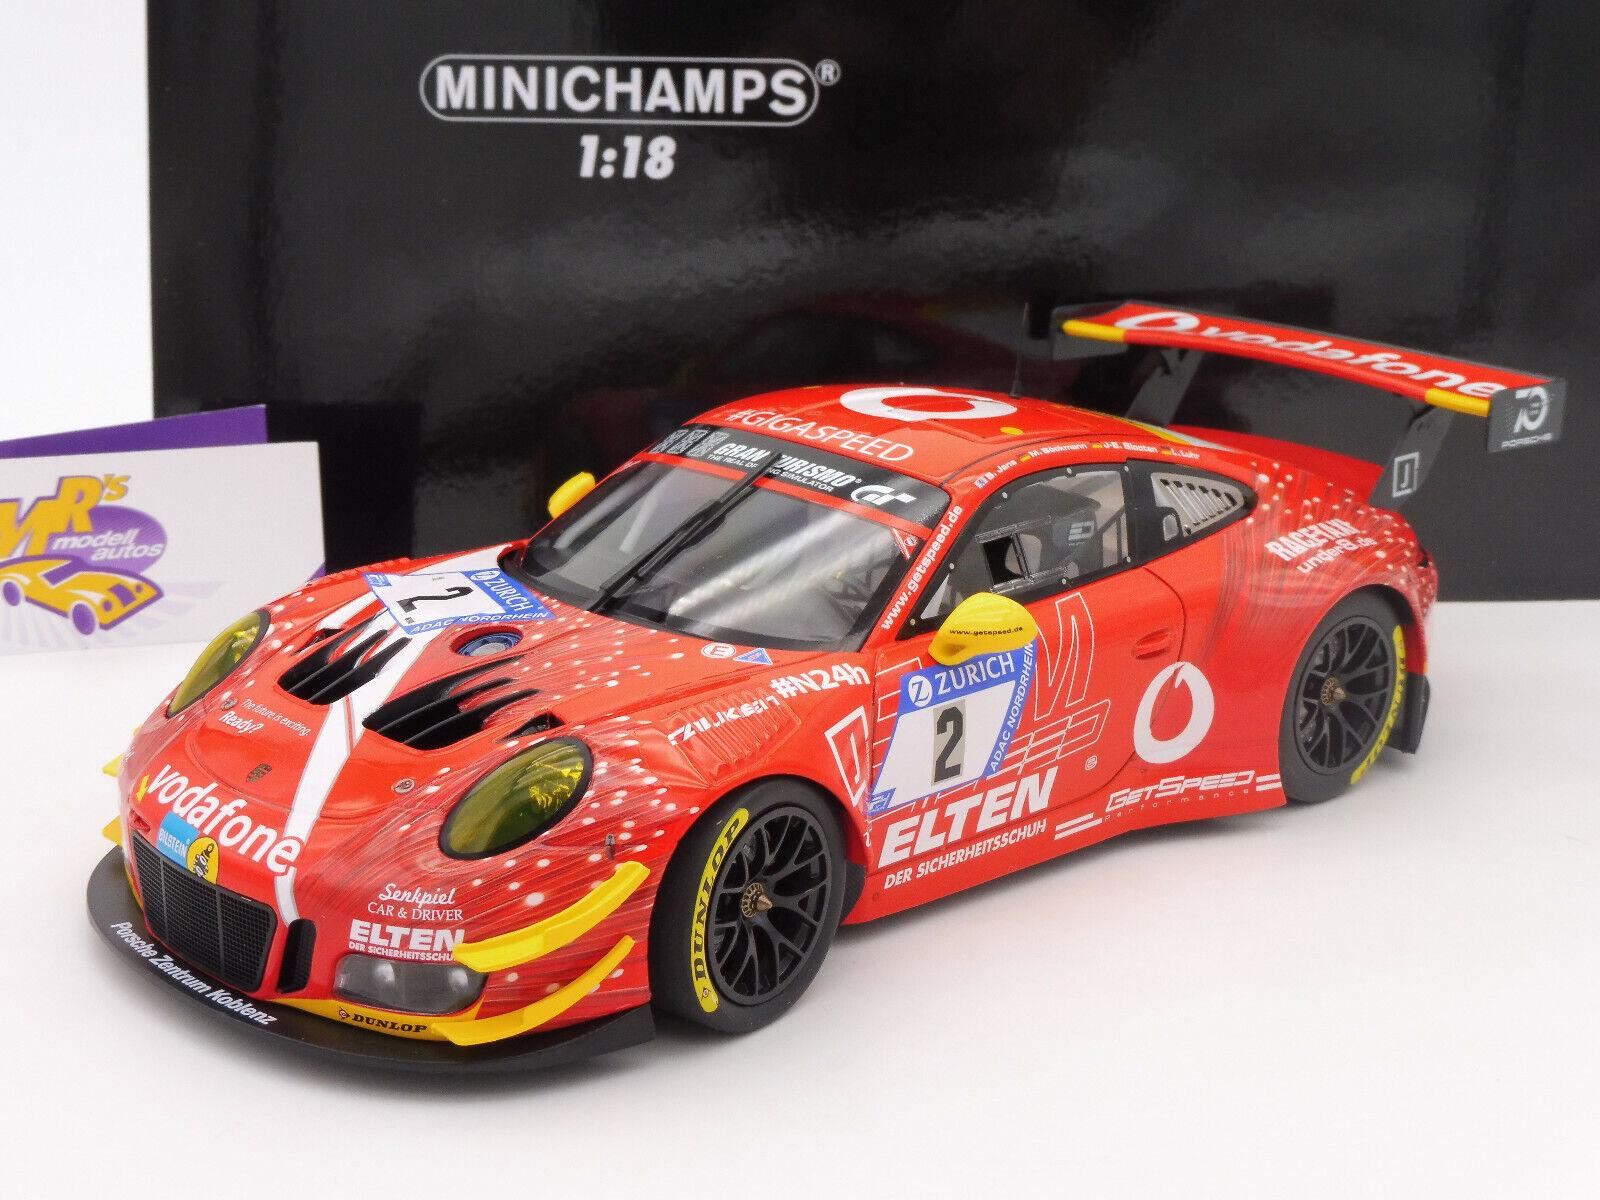 Minichamps 155186902   PORSCHE 911 GT3 R  ELTEN  24h. Nürburgring 2018 1 18